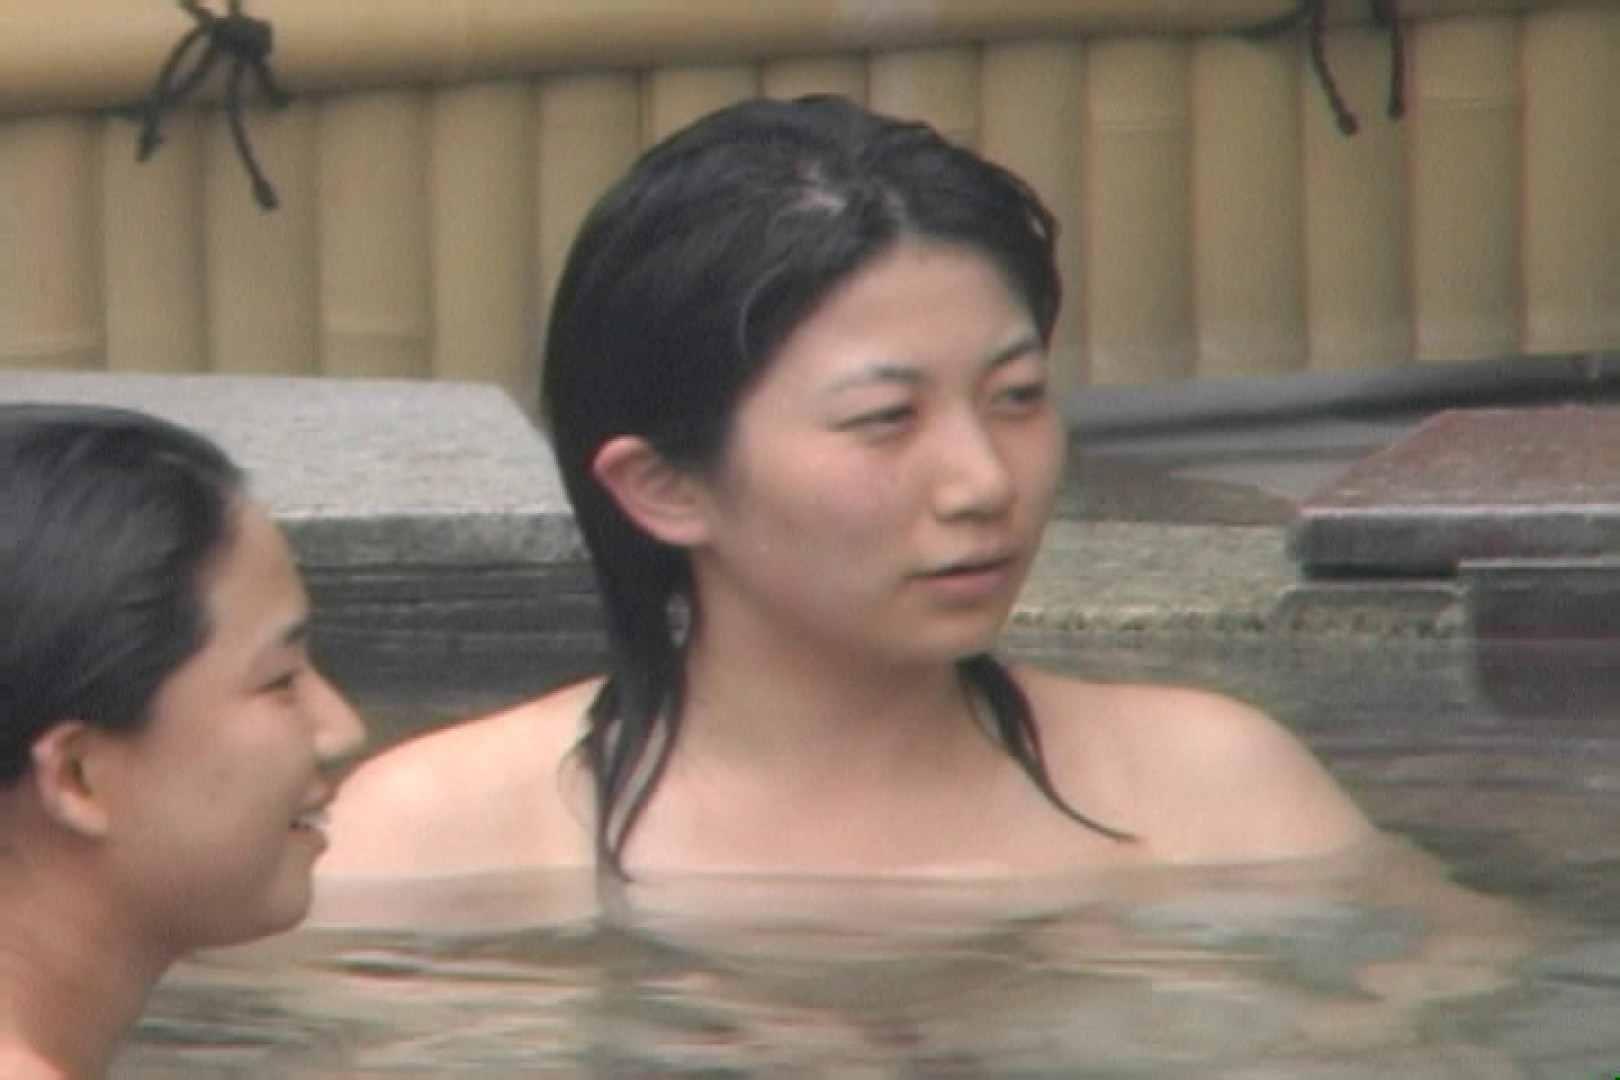 Aquaな露天風呂Vol.43【VIP限定】 露天 のぞき動画画像 88画像 32